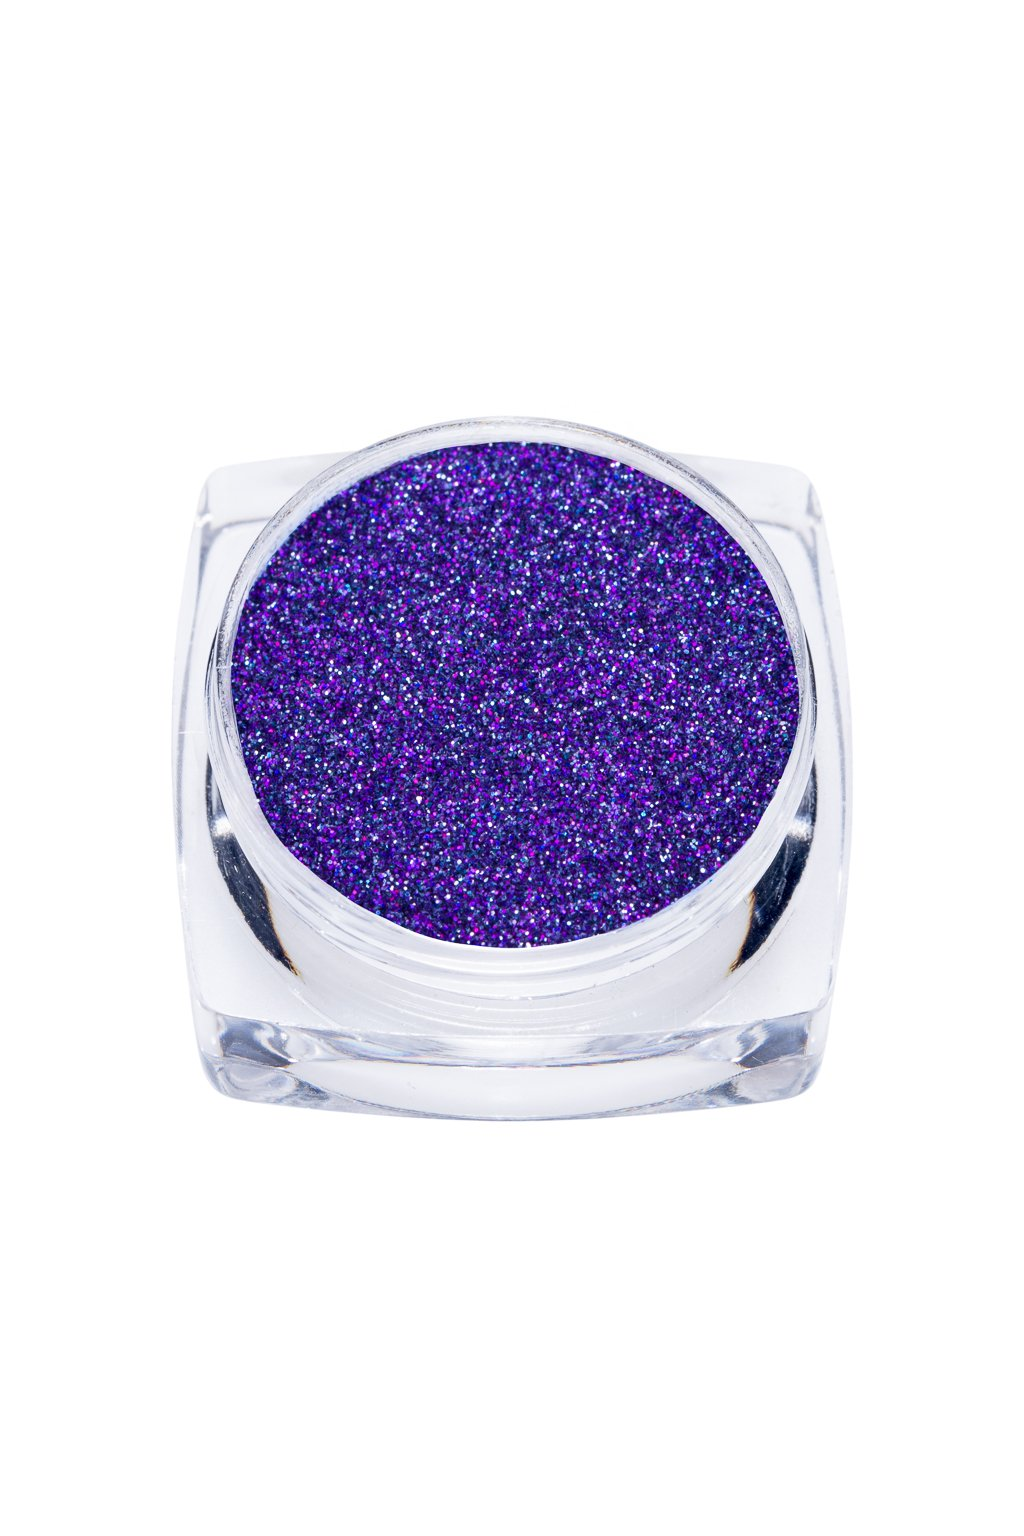 23594 sparkling mix universe